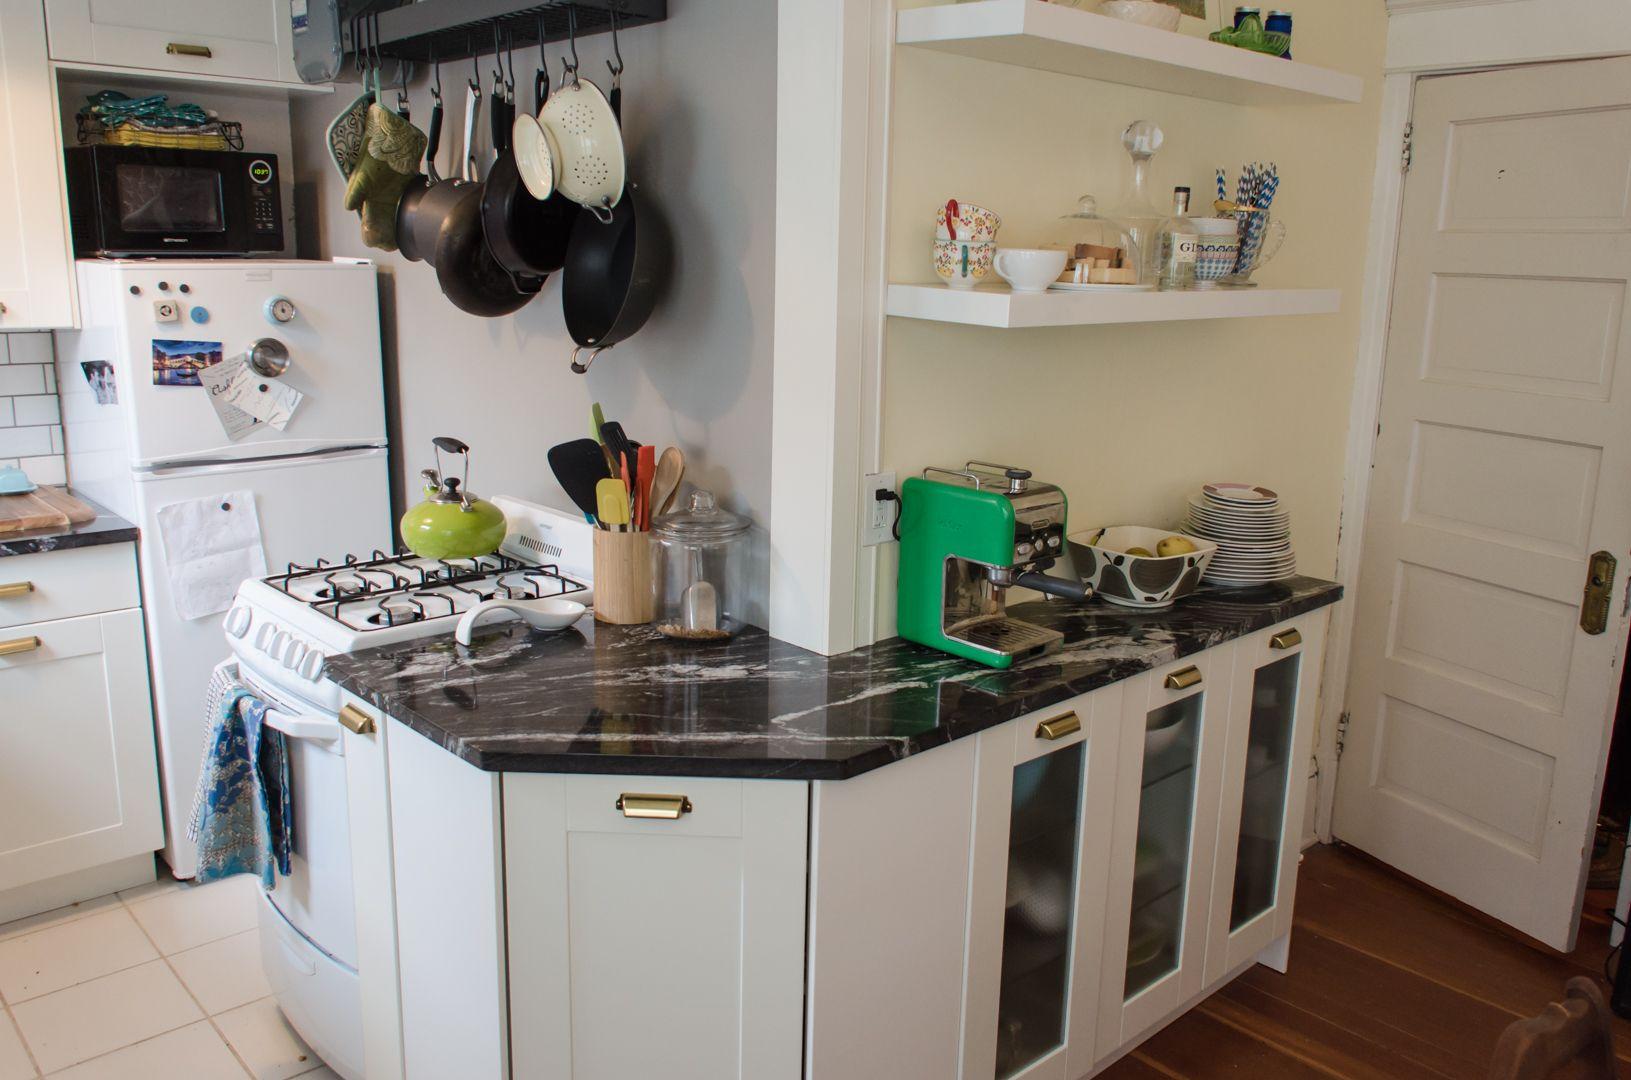 Ikeaus corner projet la cuisine pinterest small apartment